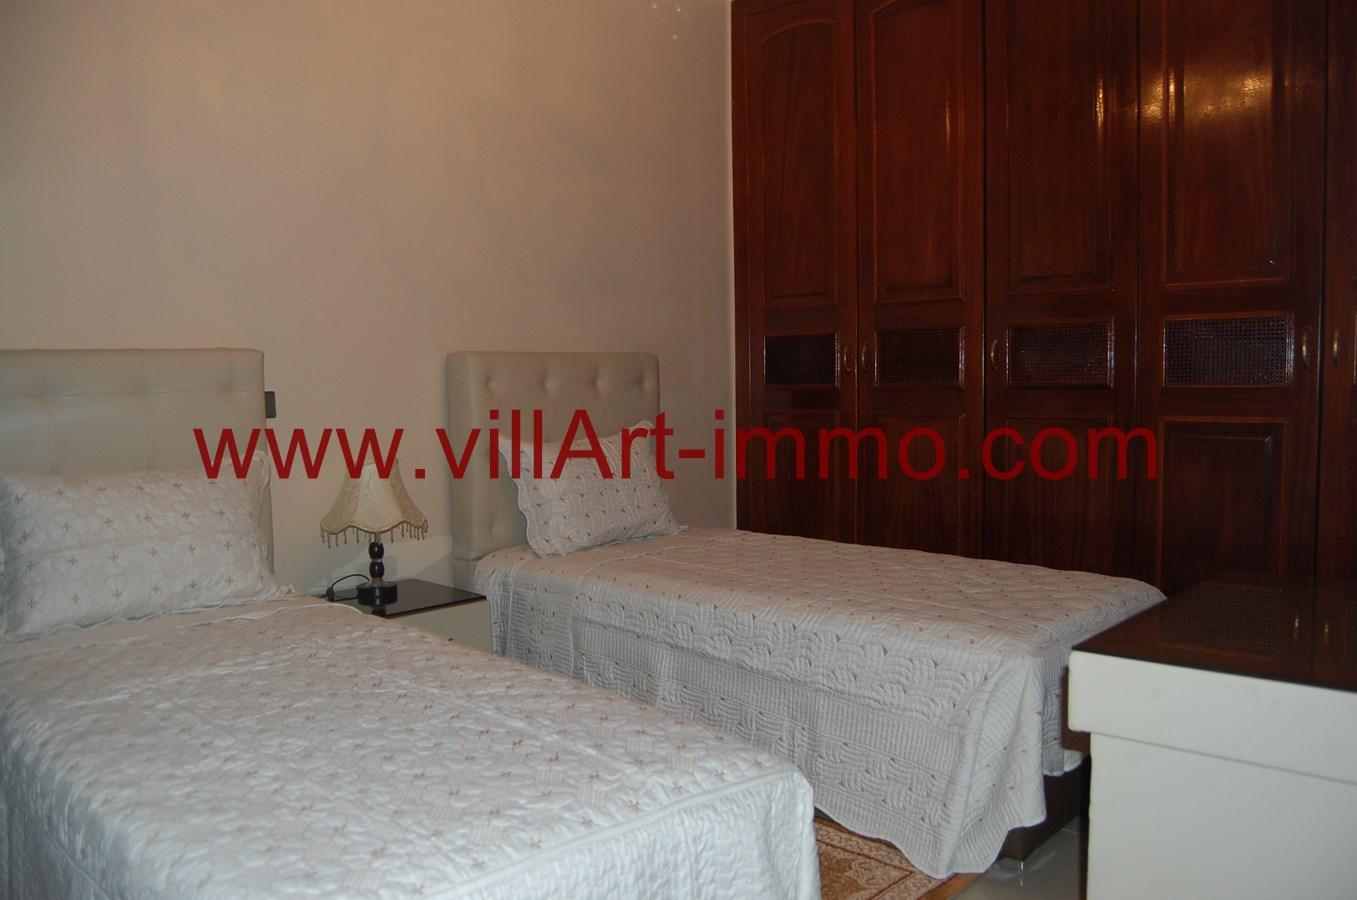 11-location-appartement-meuble-iberia-tanger-chambre-2-l895-villart-immo